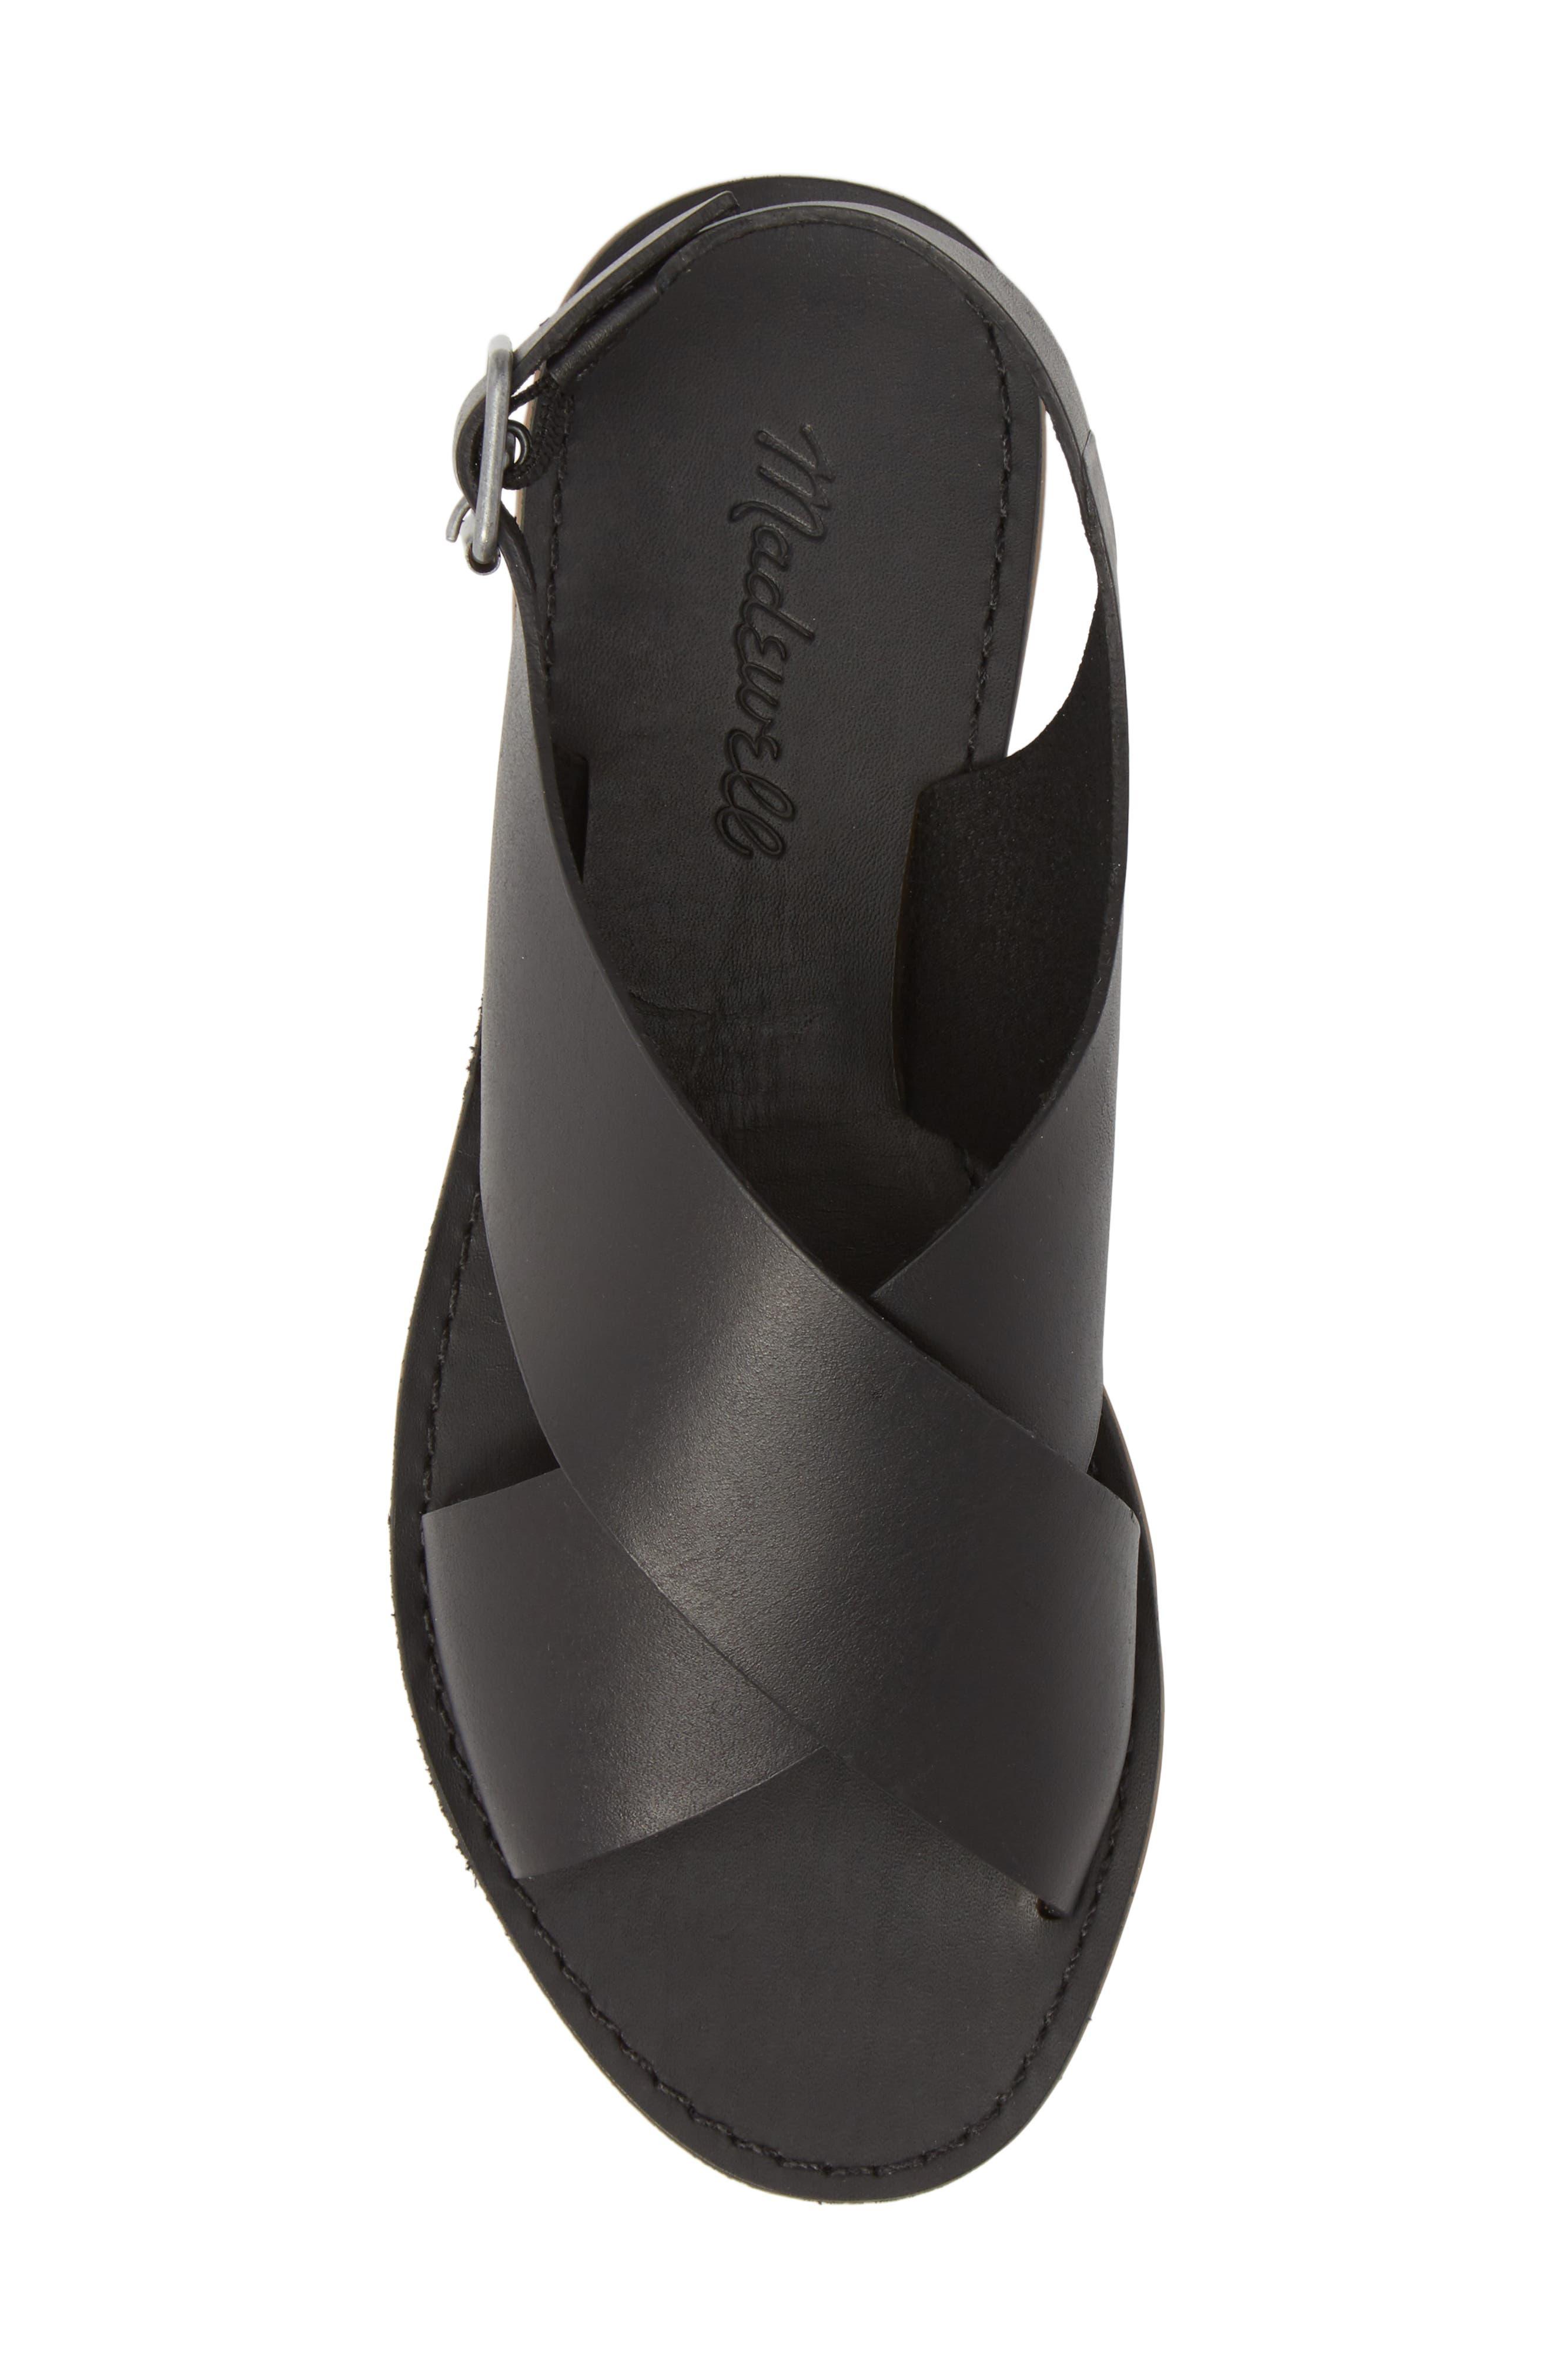 MADEWELL, Boardwalk Flat Sandal, Alternate thumbnail 5, color, TRUE BLACK